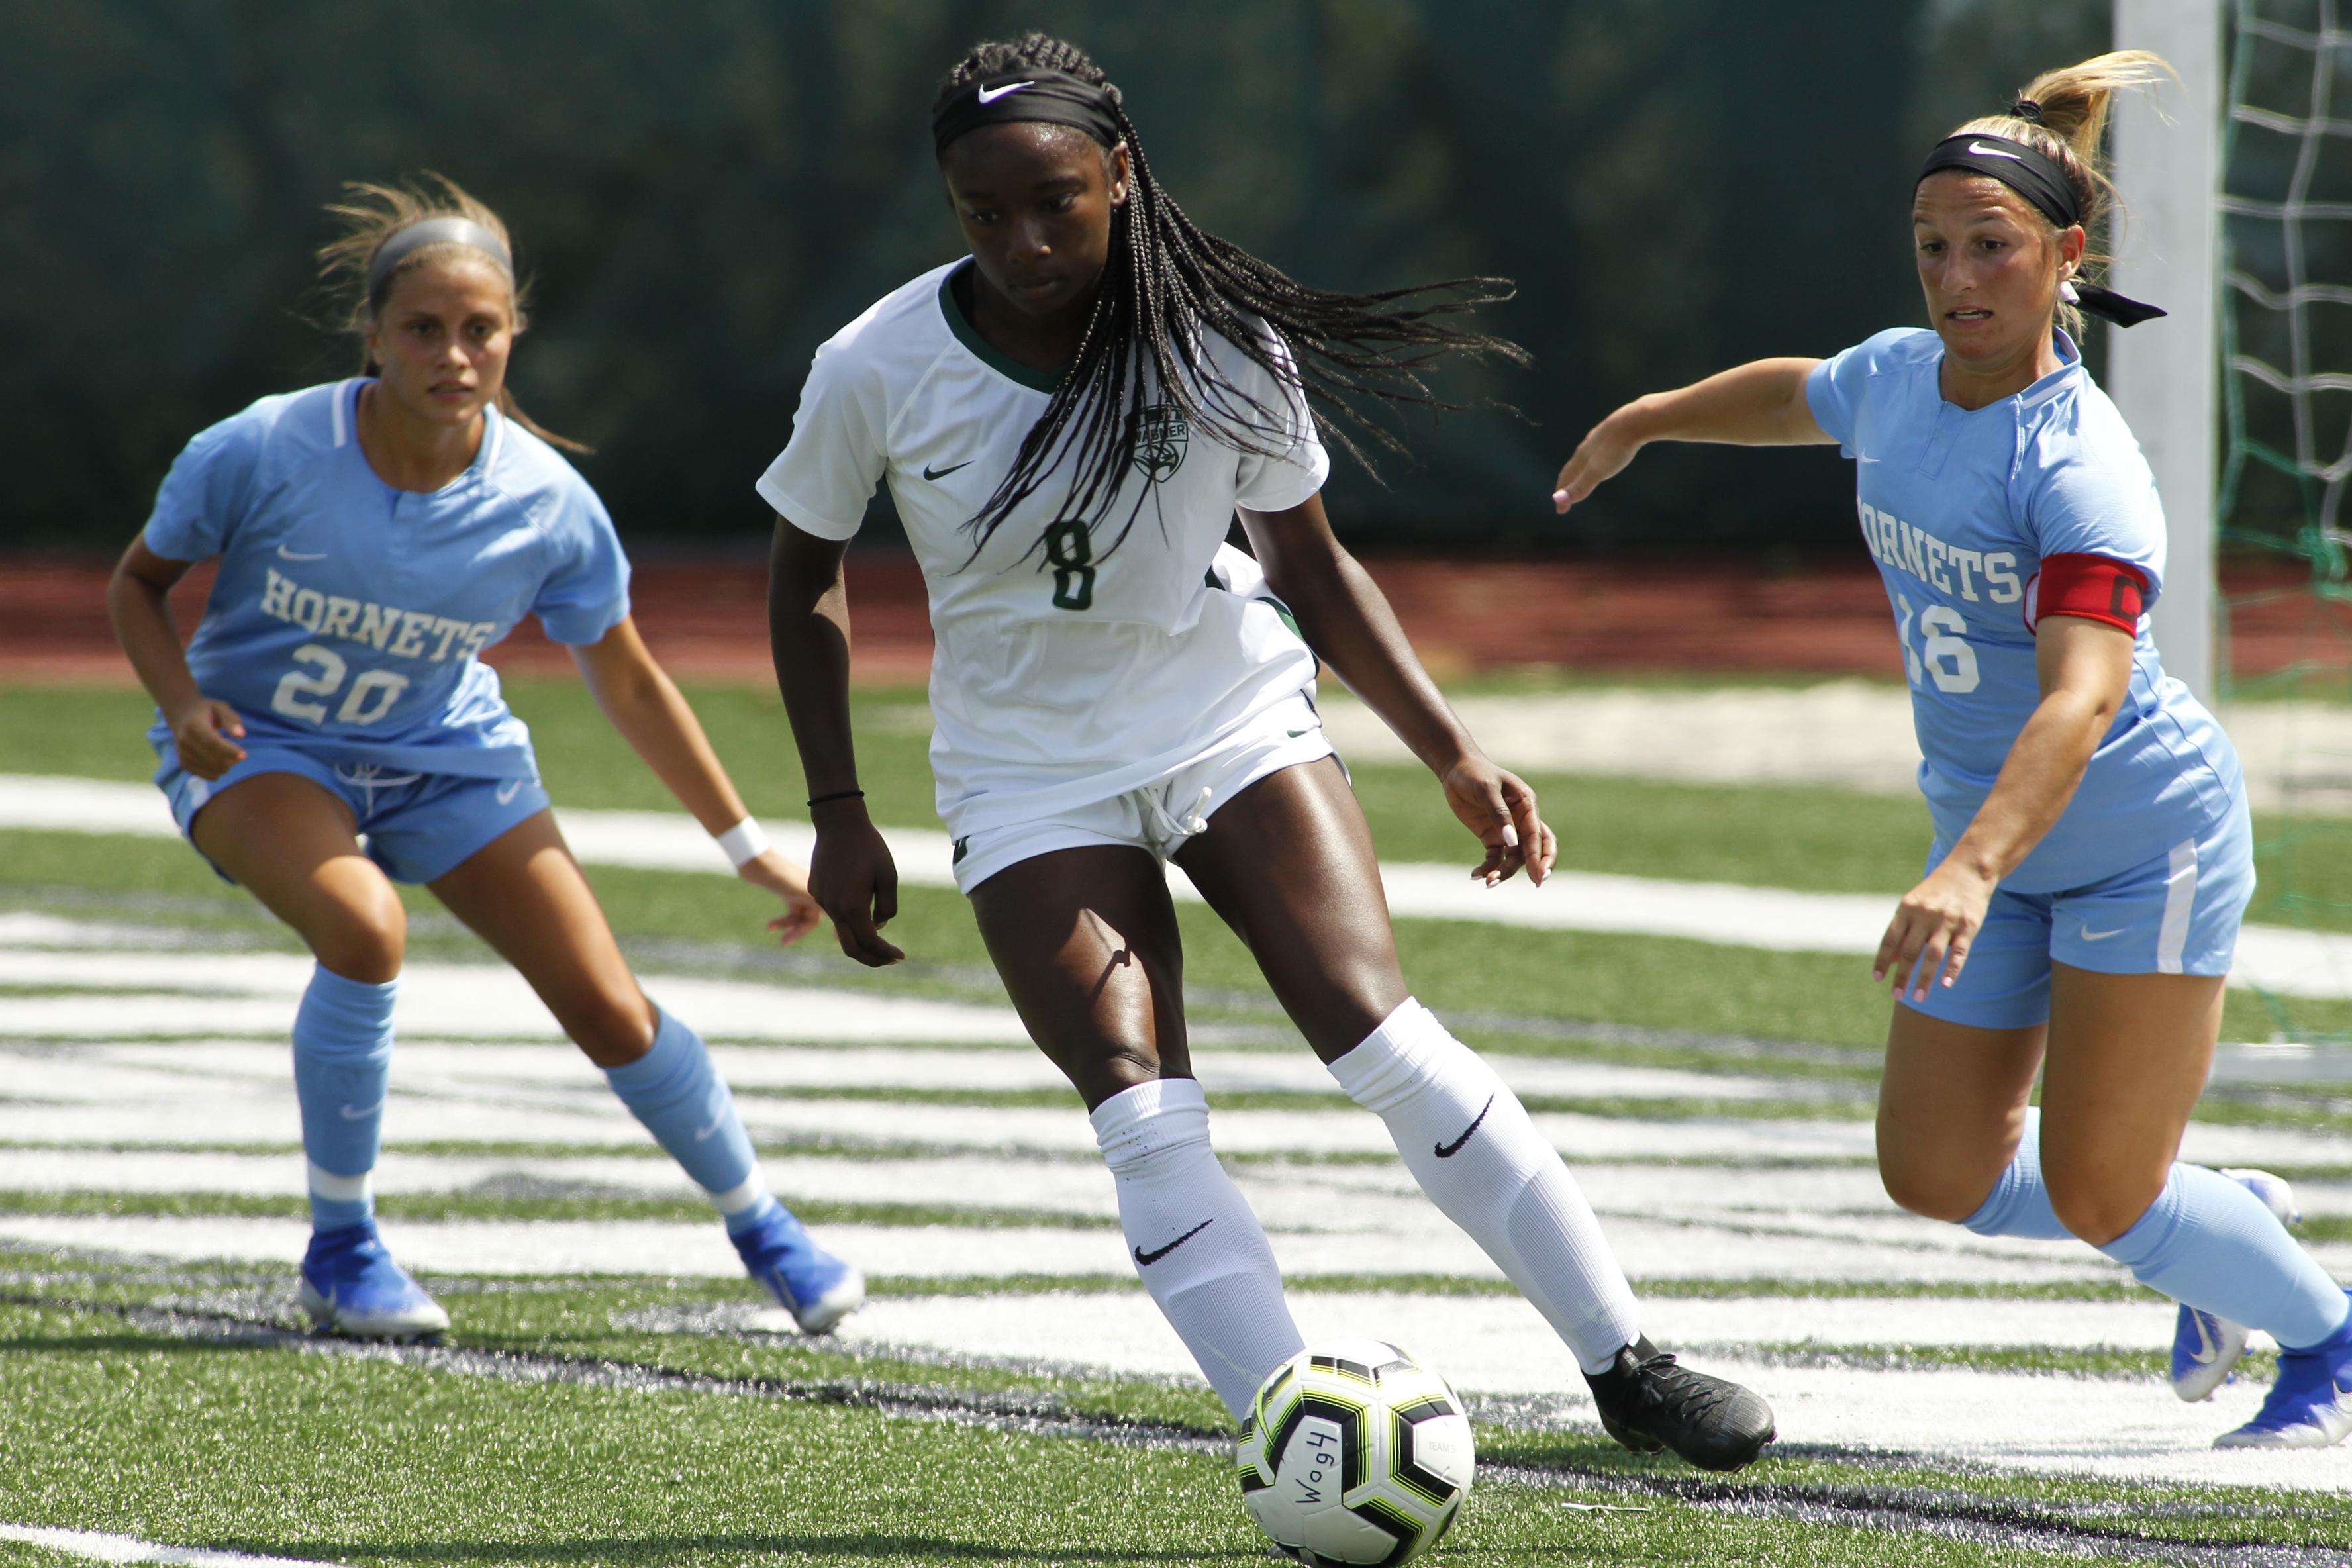 Allen's game-winner carries Wagner women's soccer team to thrilling 3-2 OT win over Iona